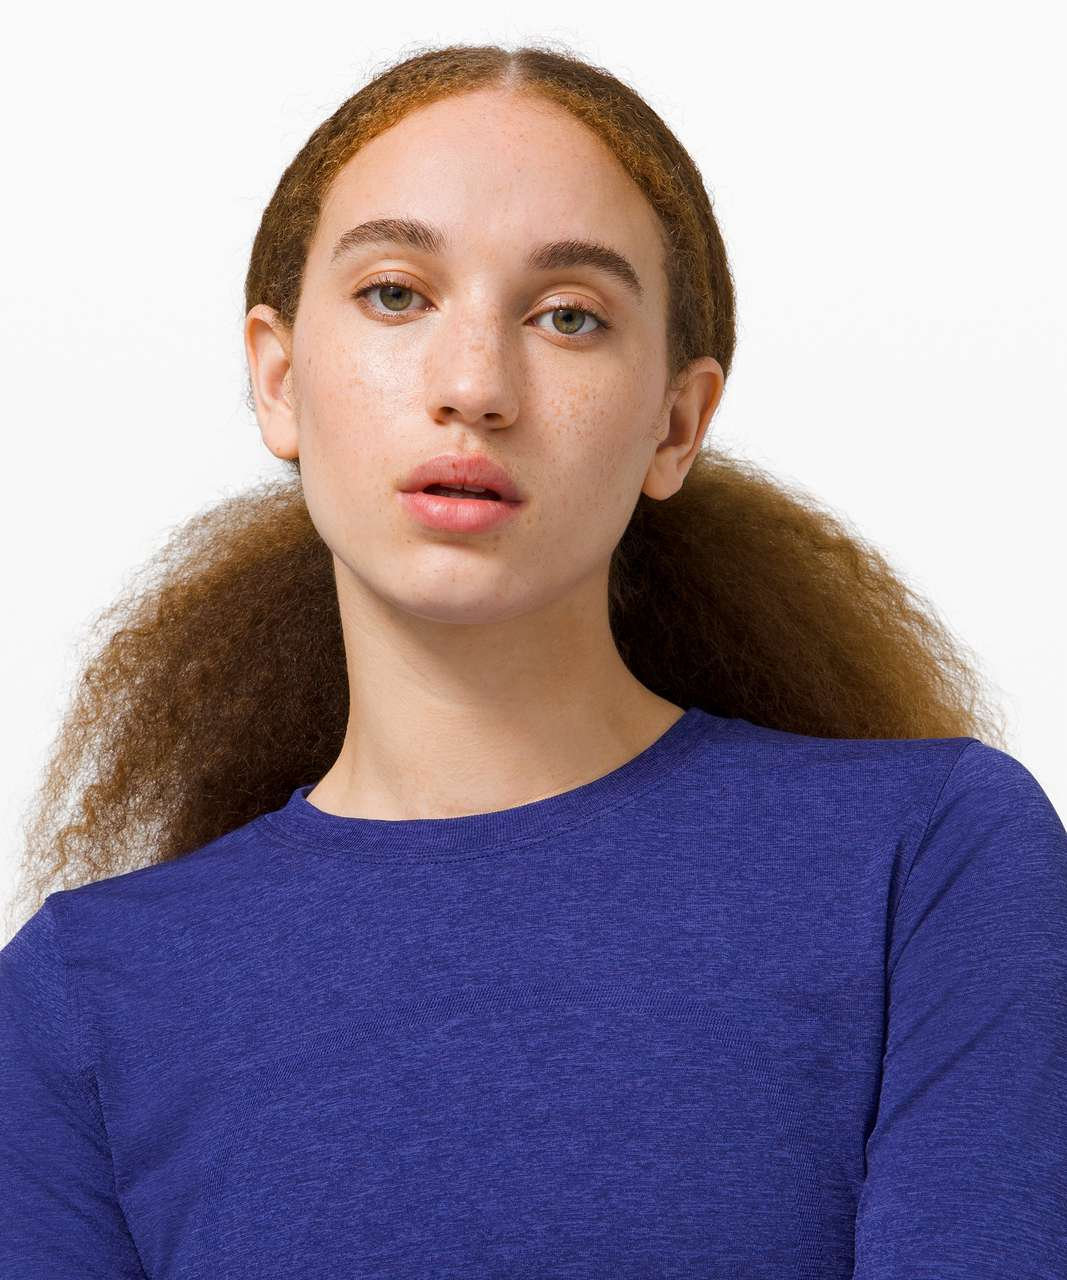 Lululemon Swiftly Breathe Long Sleeve - Blazer Blue / Larkspur